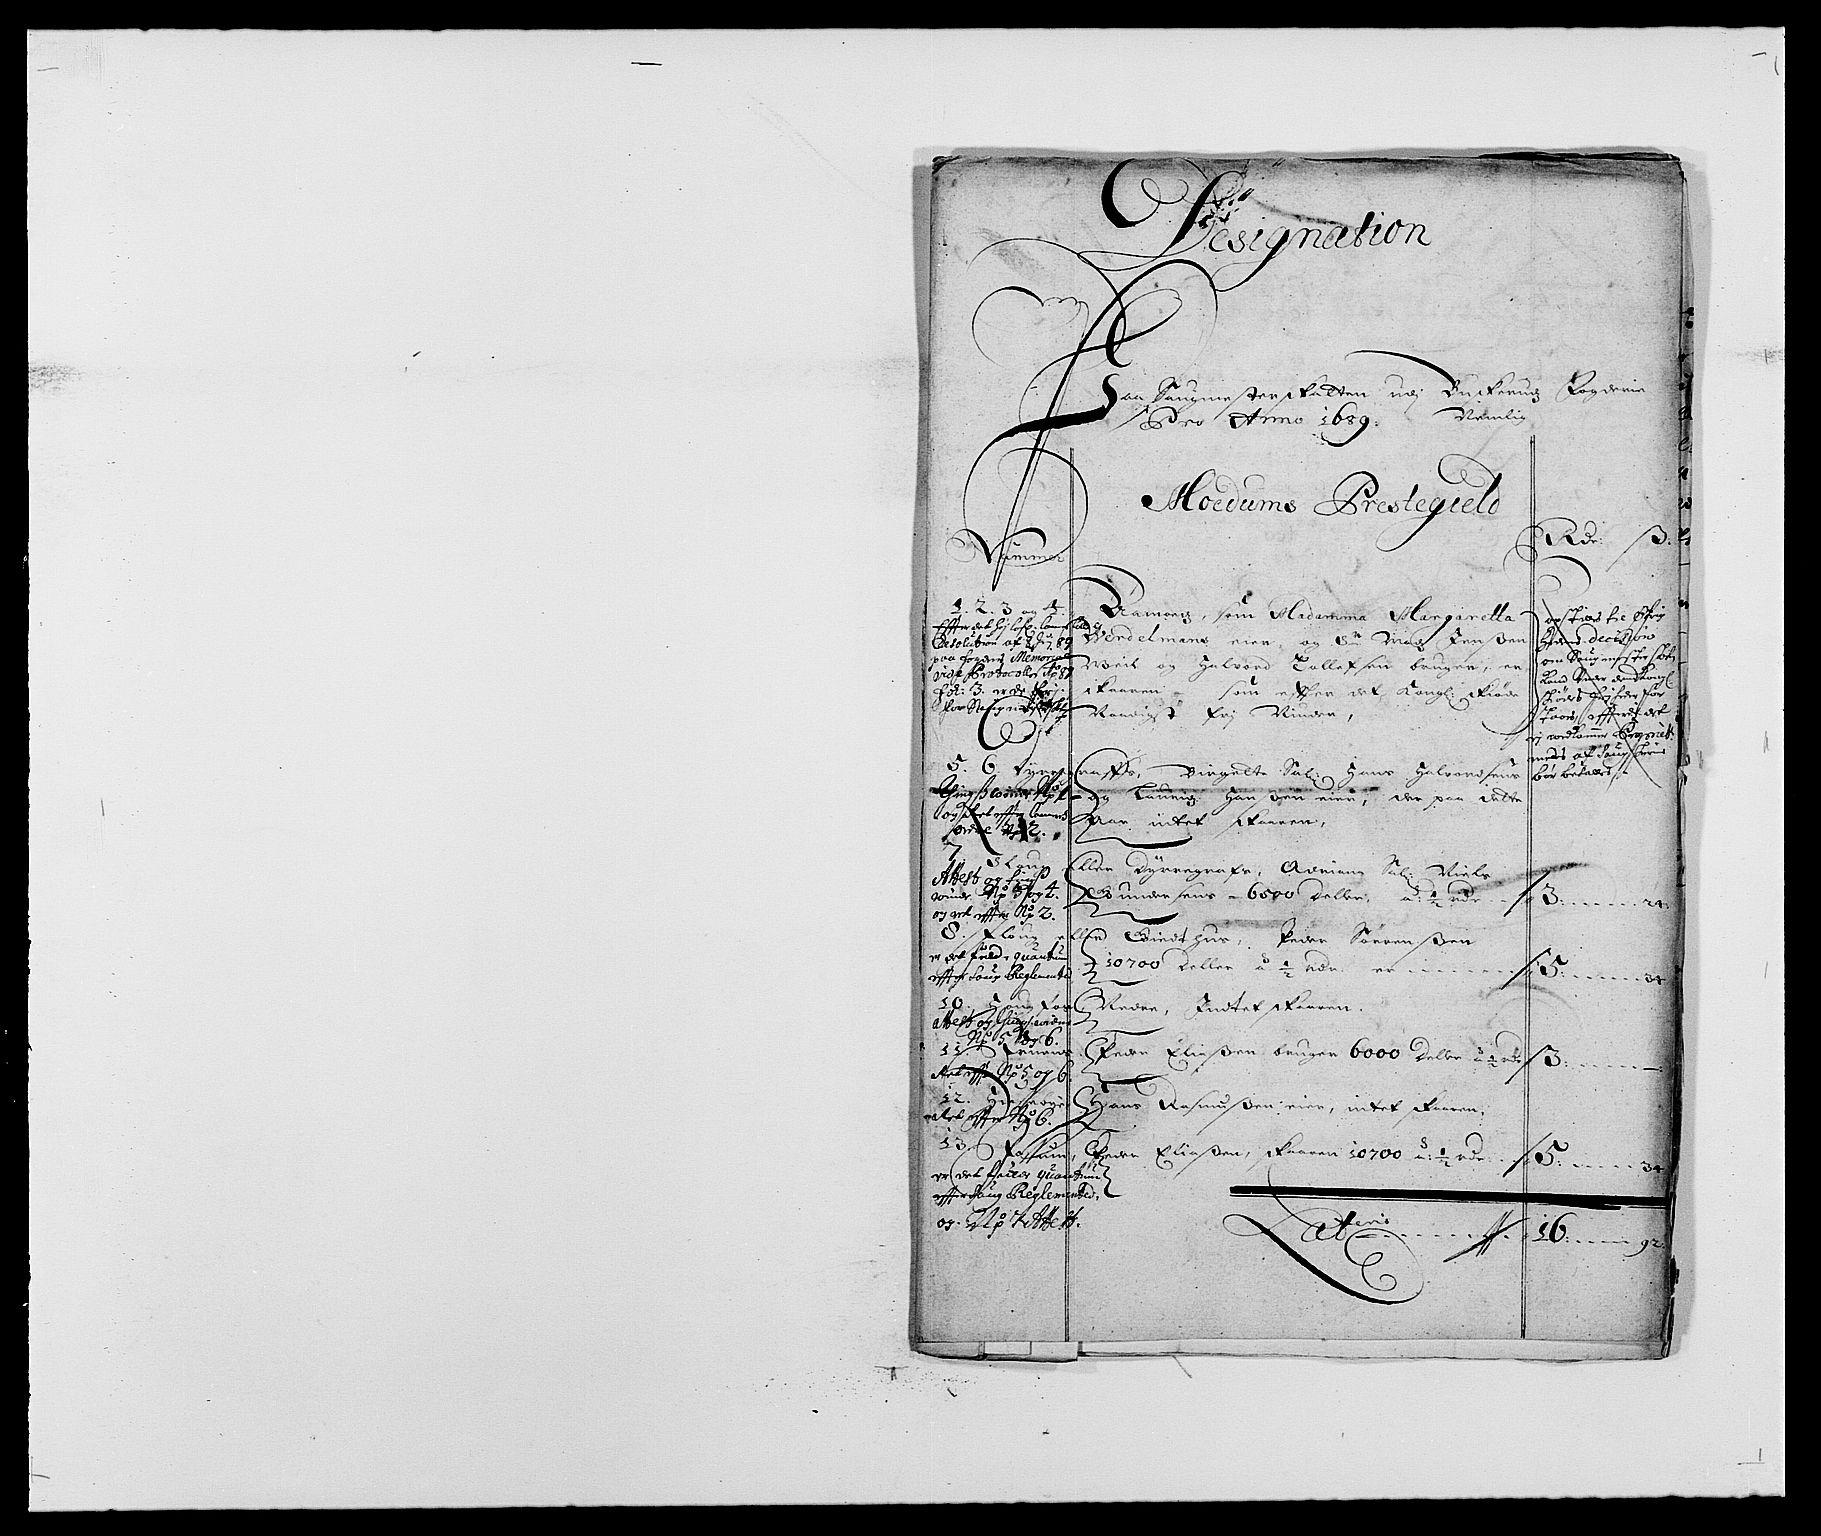 RA, Rentekammeret inntil 1814, Reviderte regnskaper, Fogderegnskap, R25/L1680: Fogderegnskap Buskerud, 1689-1690, s. 158